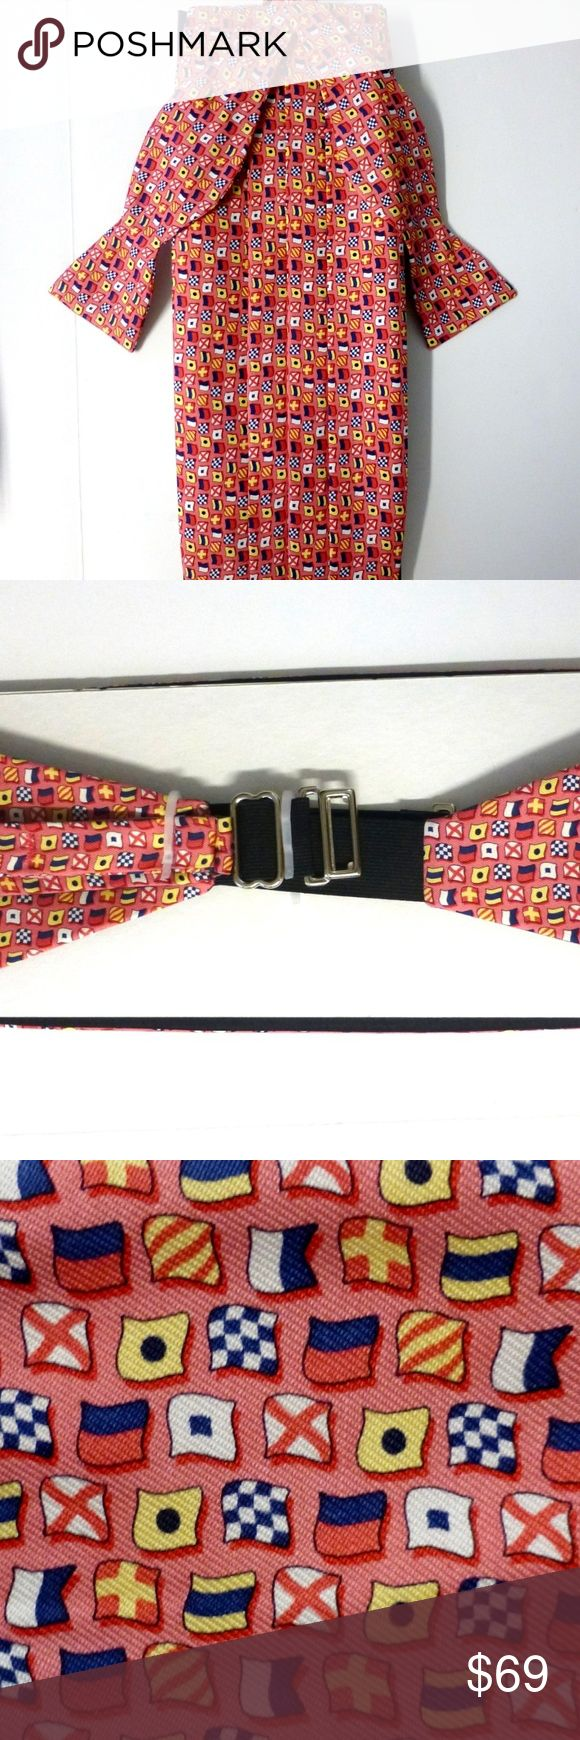 Vineyard Vines Silk Bow Tie & Cumberbund Set Nwt Nwt